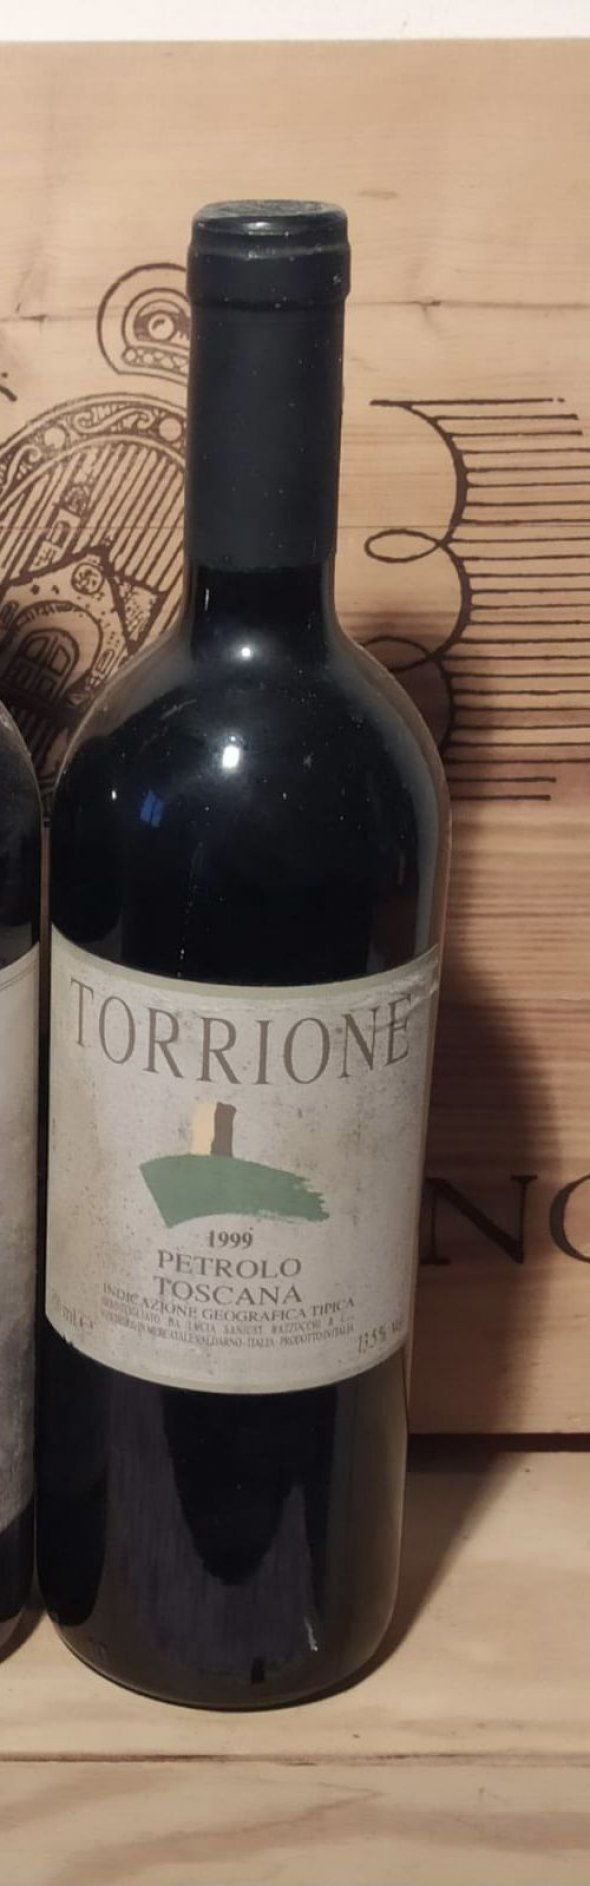 Petrolo, Torrione, IGT